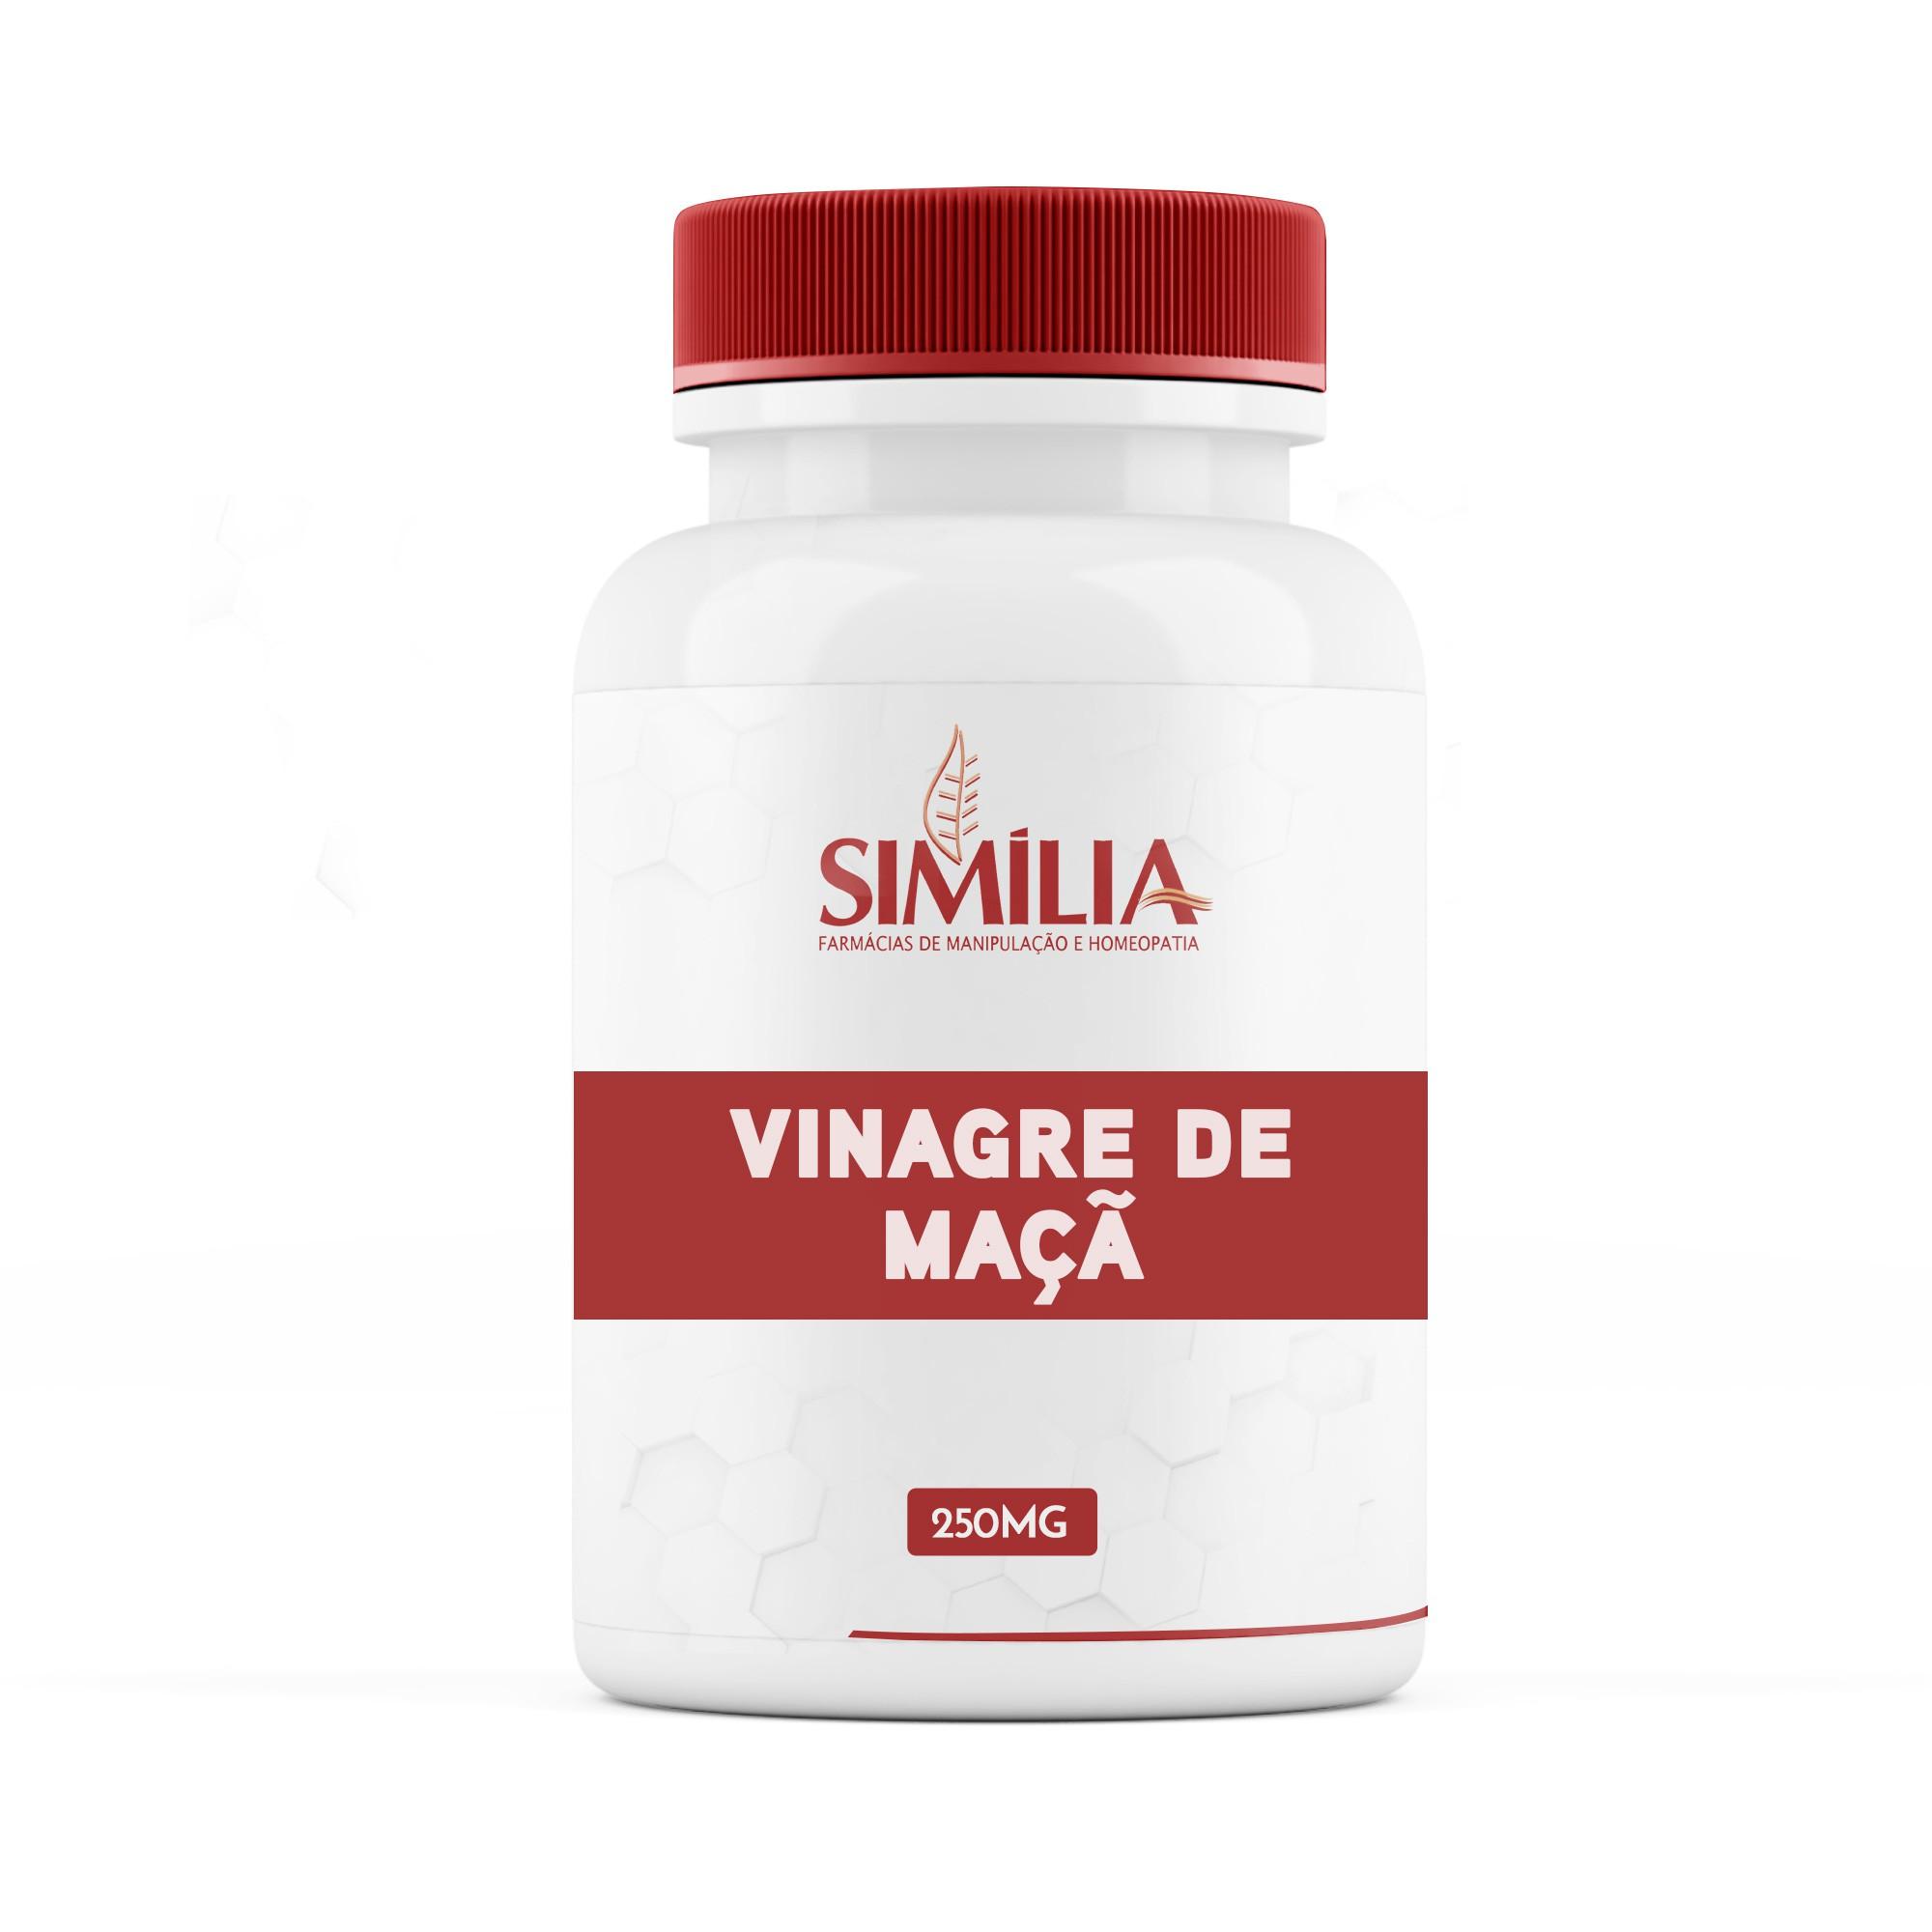 Vinagre de Maça 250mg - Extrato Seco - 60 cápsulas